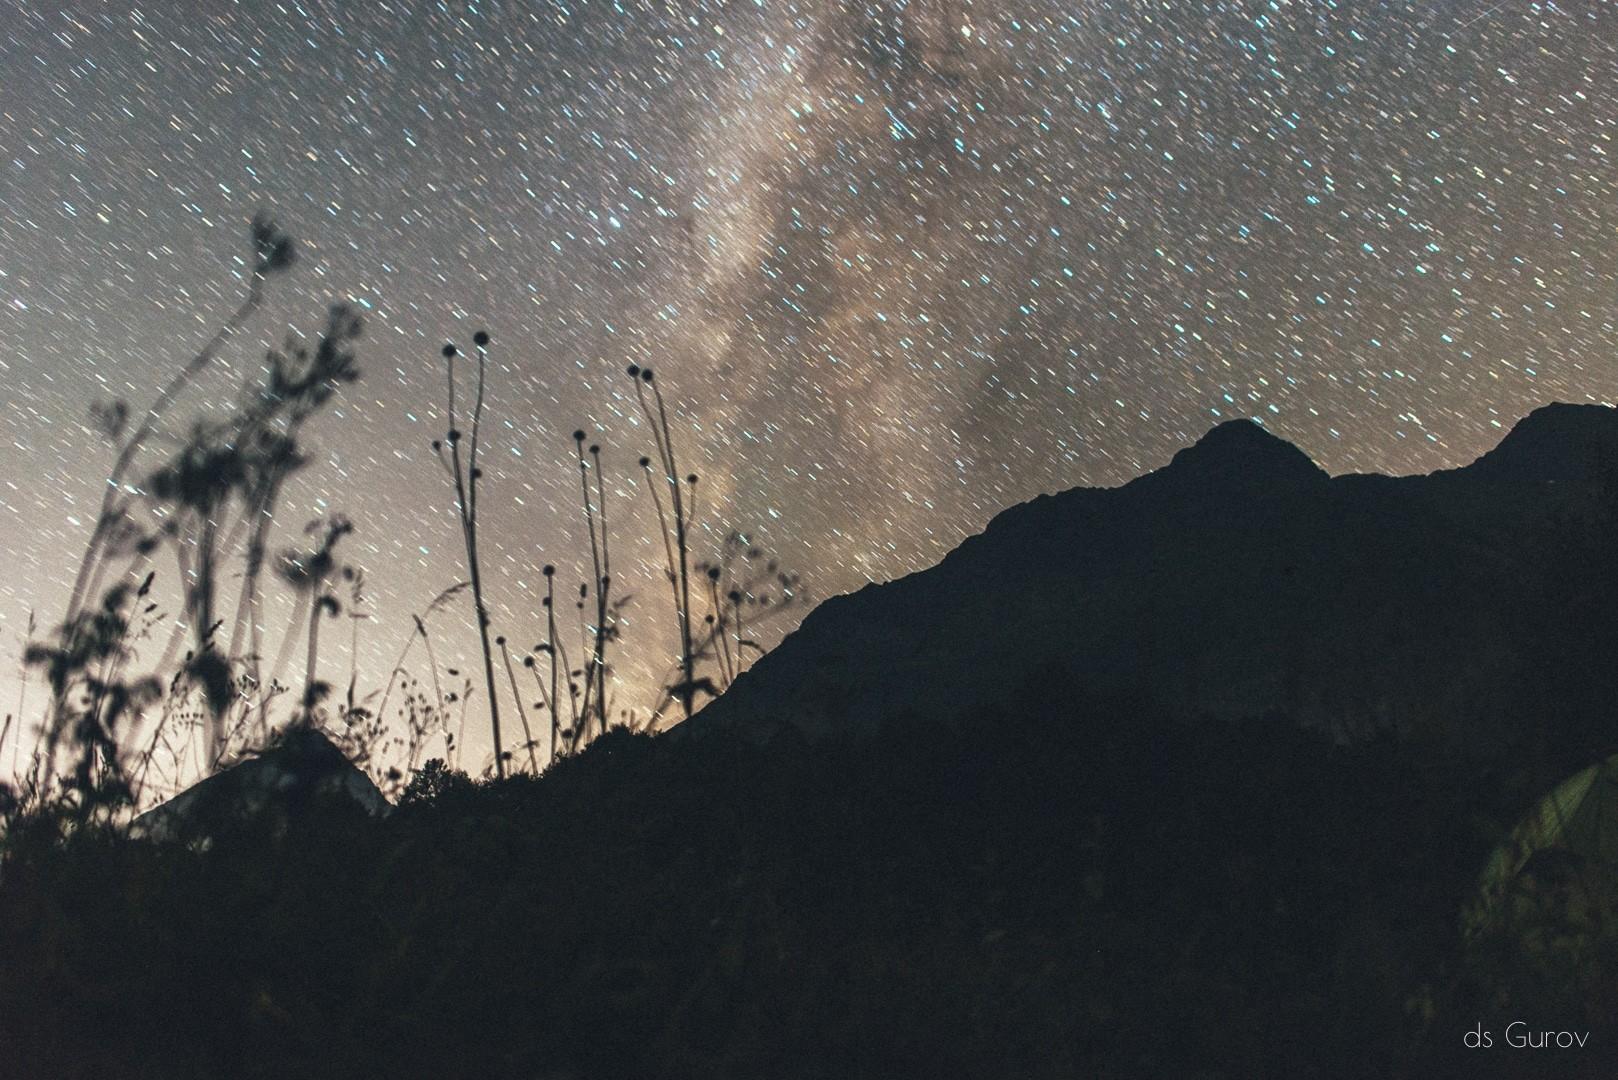 звёзды над кавказскими горами